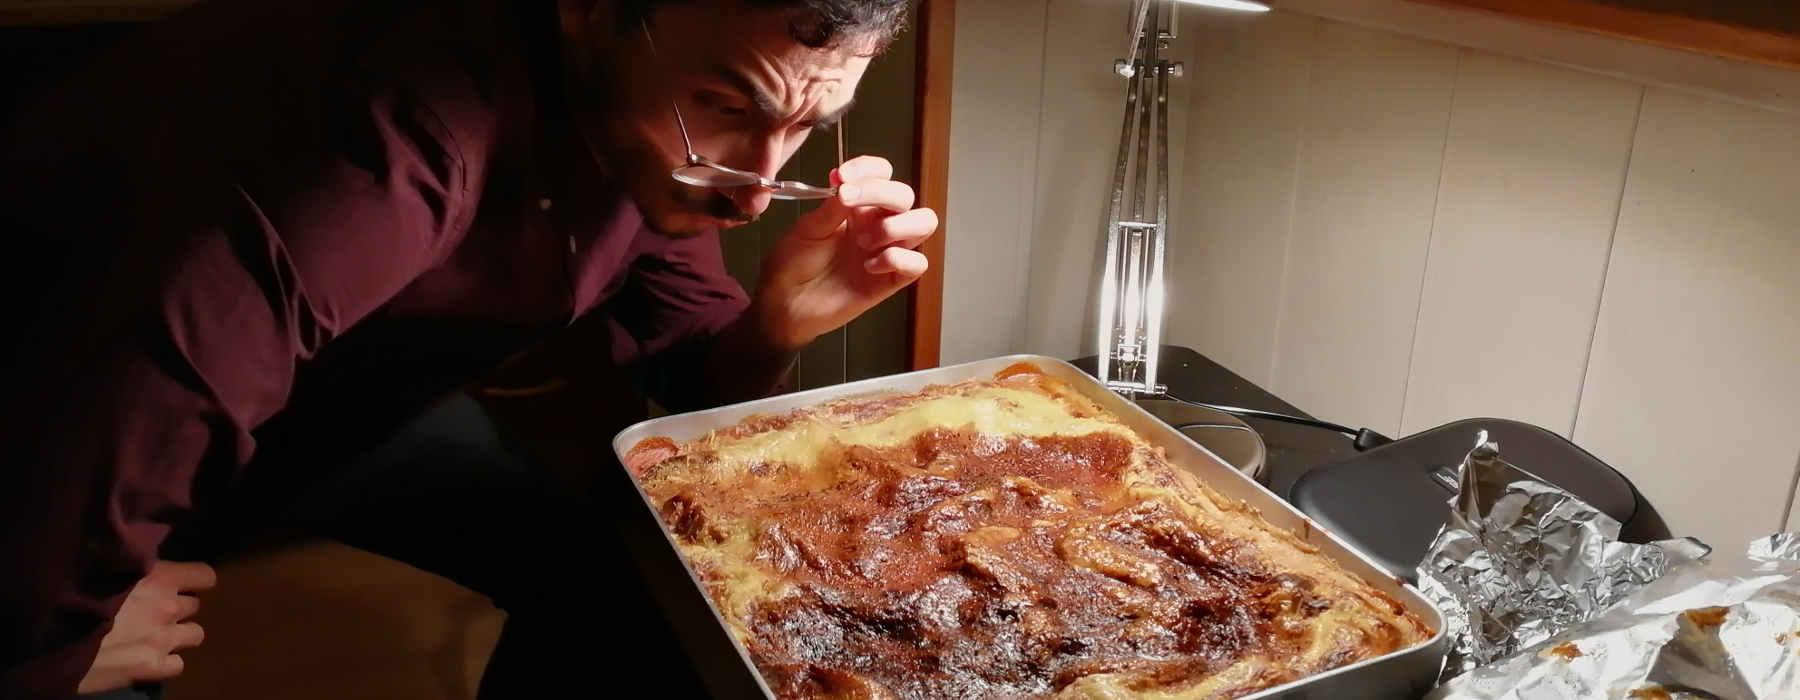 Recette lasagne vegan PST 2